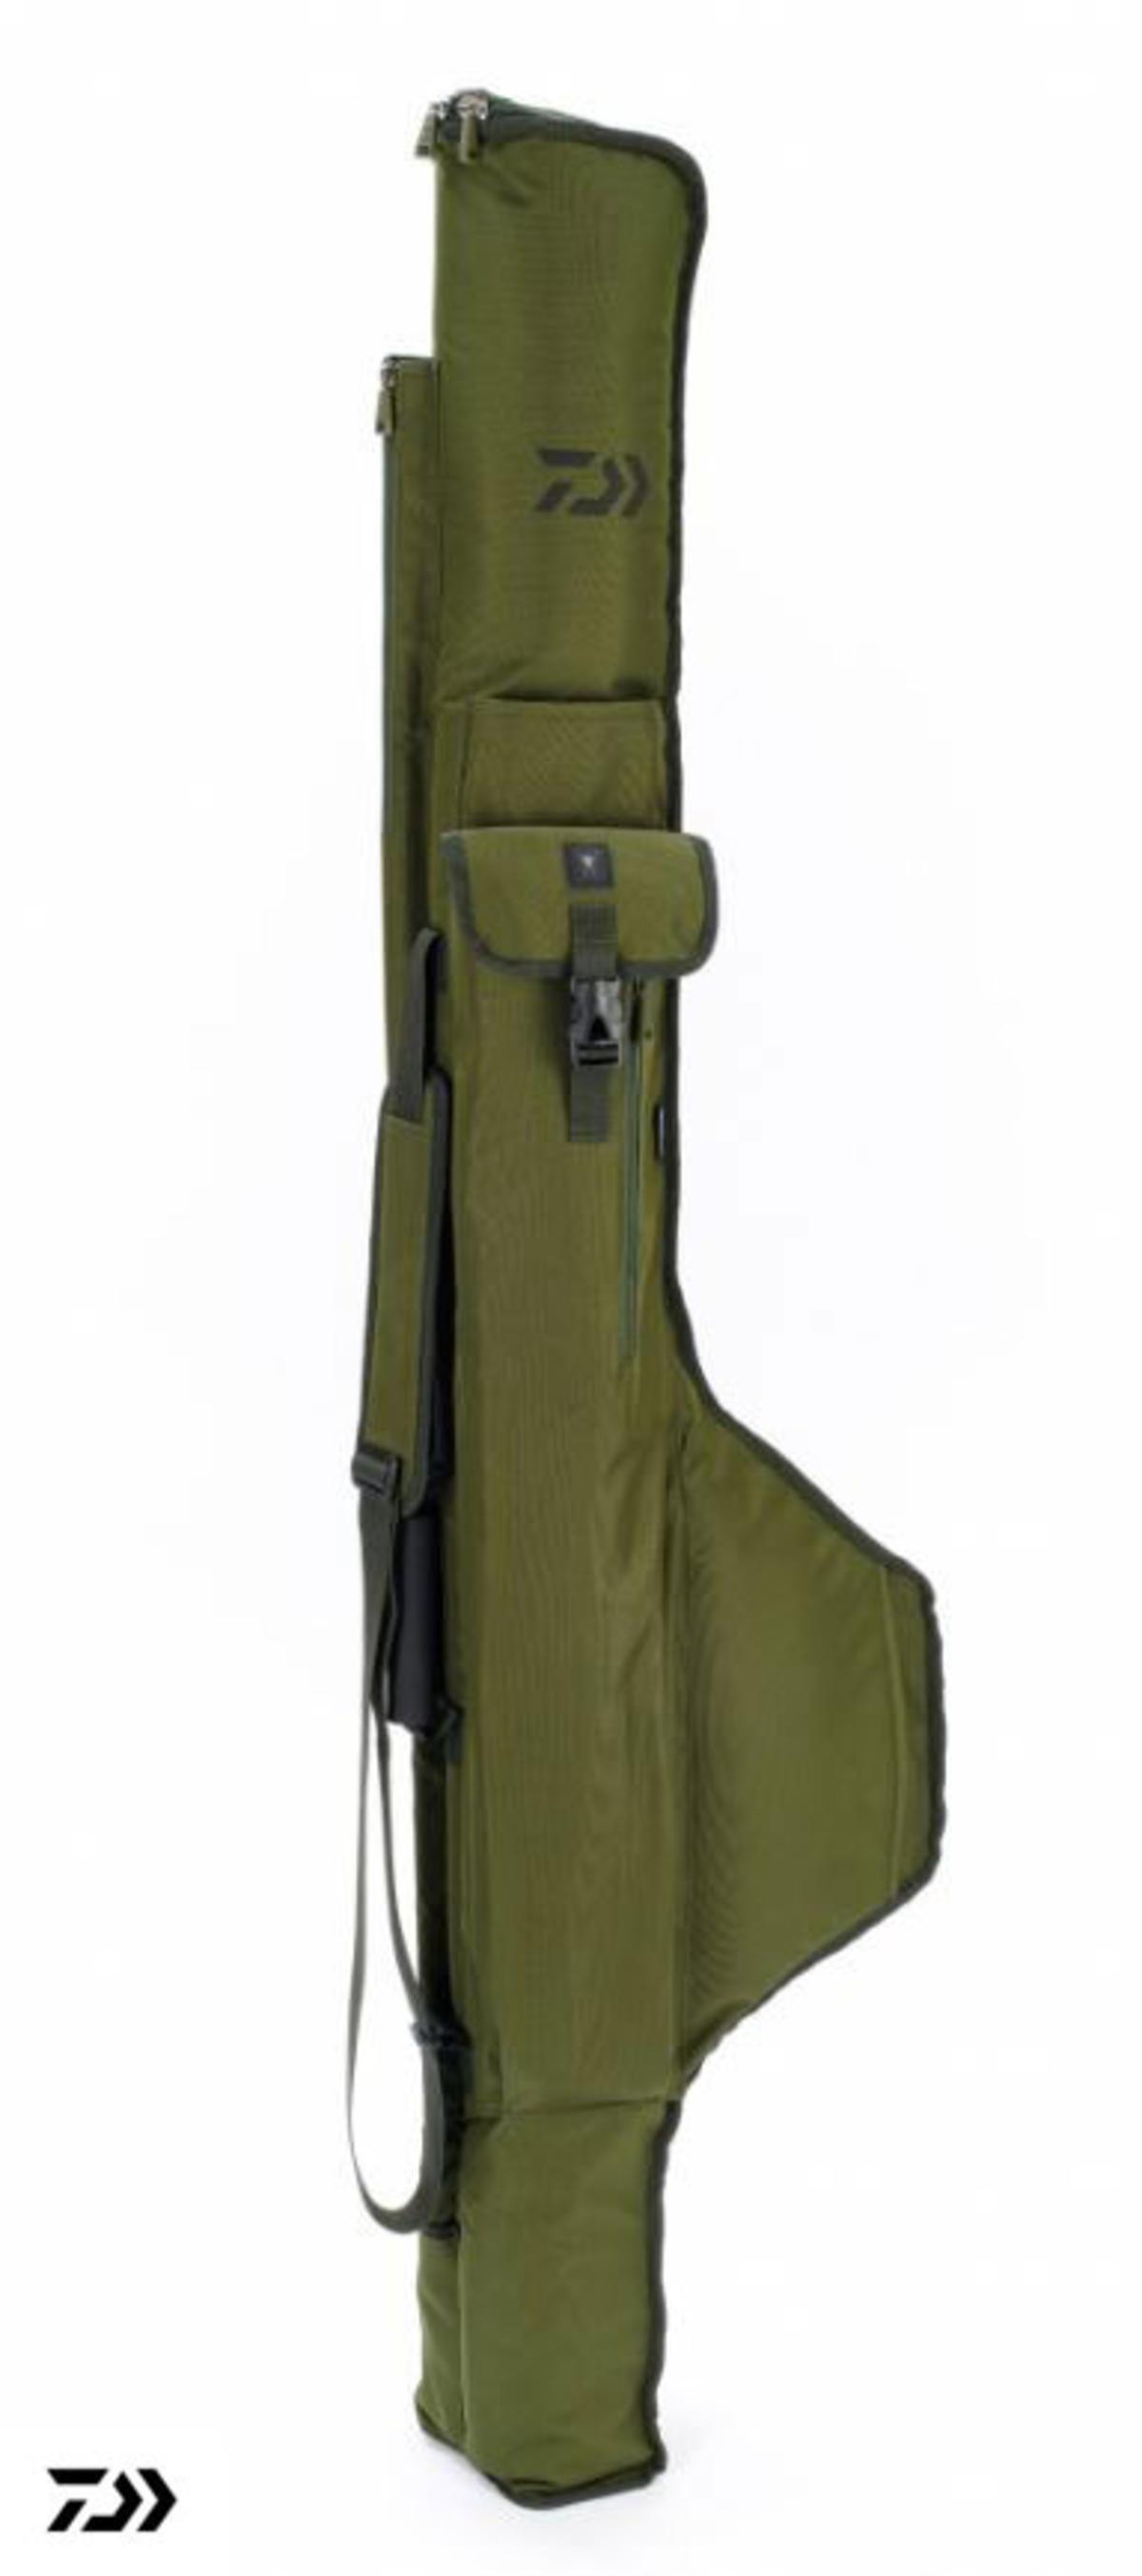 New Daiwa Black Widow 10ft - 3 Rod Fishing Holdall / Carp Luggage - BW3R10H